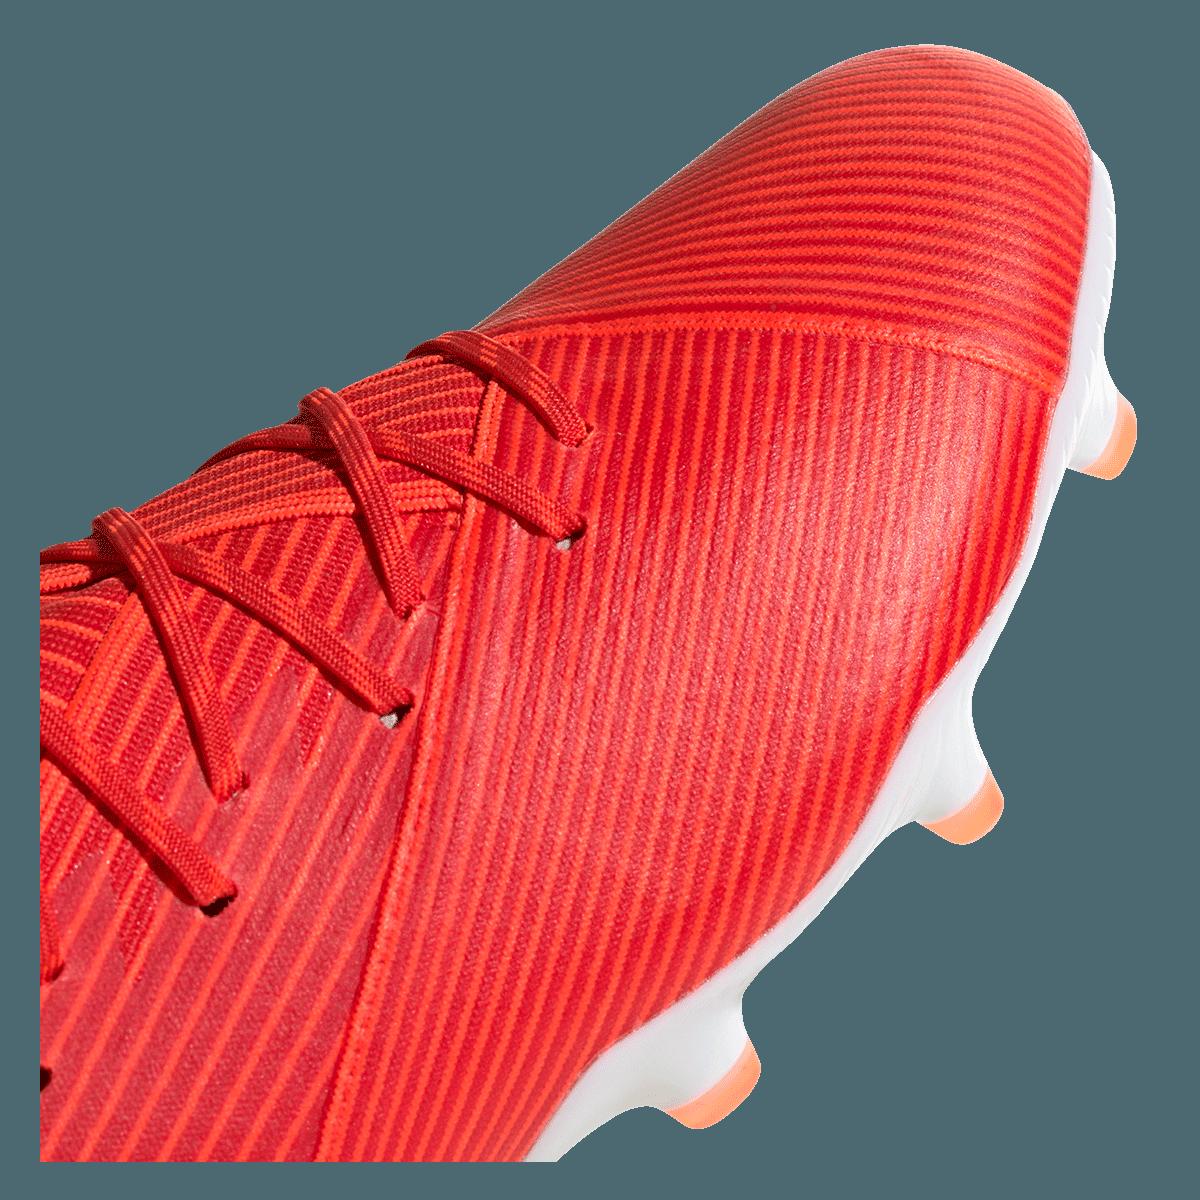 adidas Fußballschuh Nemeziz Messi 19.1 FG dunkelblaugrün fluo